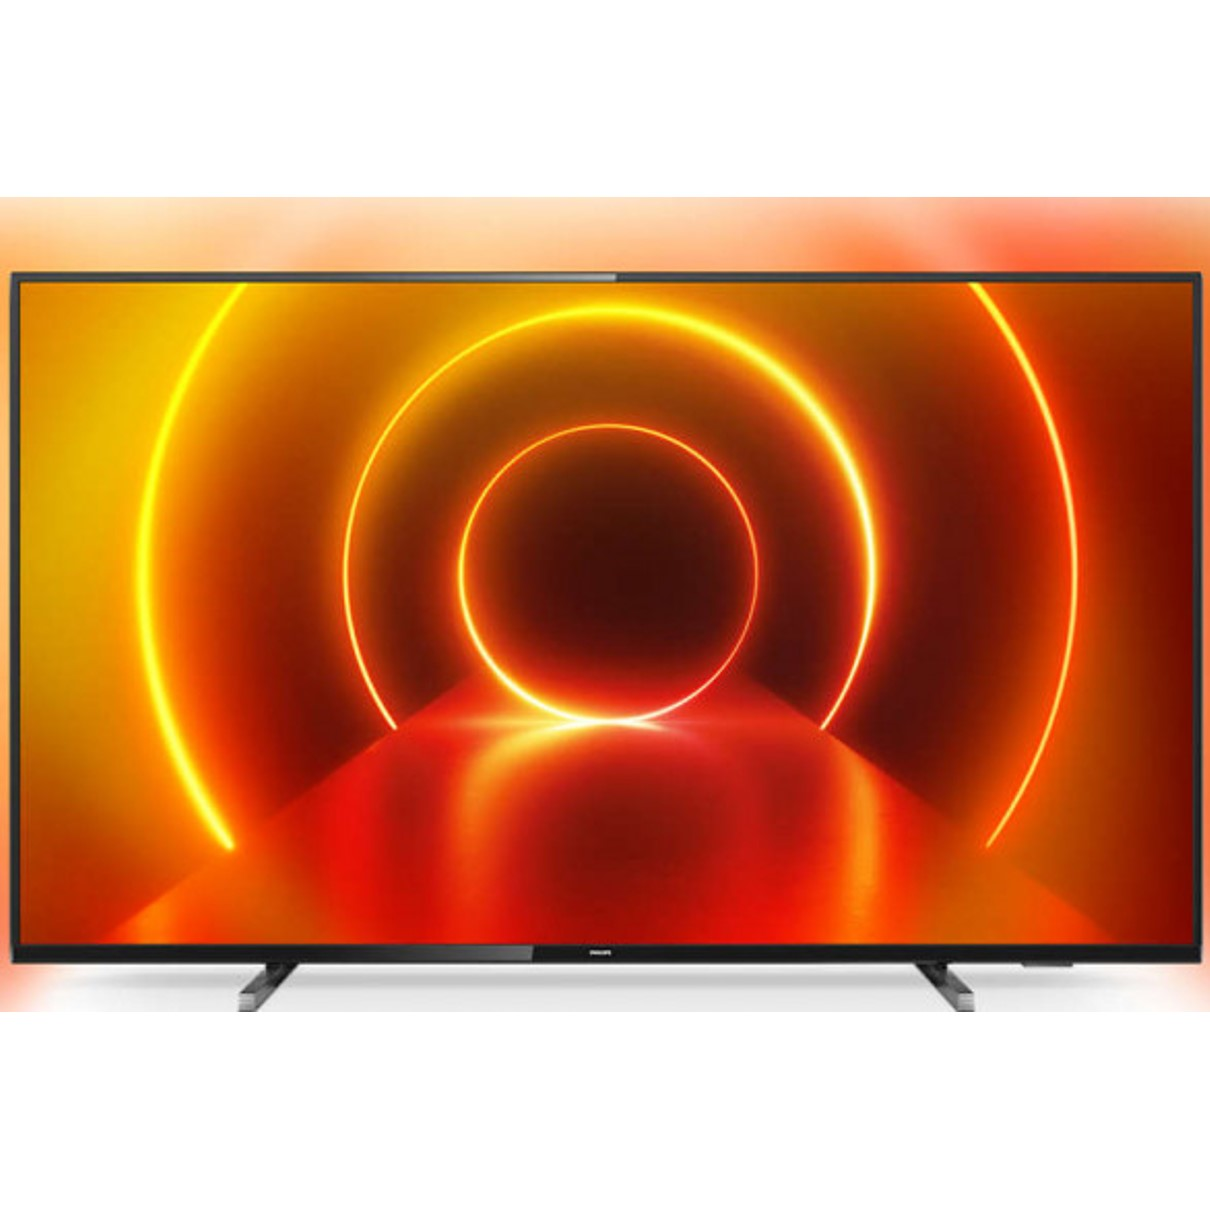 Tv philips 55pulgadas led 4k uhd -  55pus7805 -  ambilight -  hdr10+ -  smart tv -  3 hdmi -  2 usb -  dvb - t - t2 - t2 - hd - c - s - s2 -  wifi